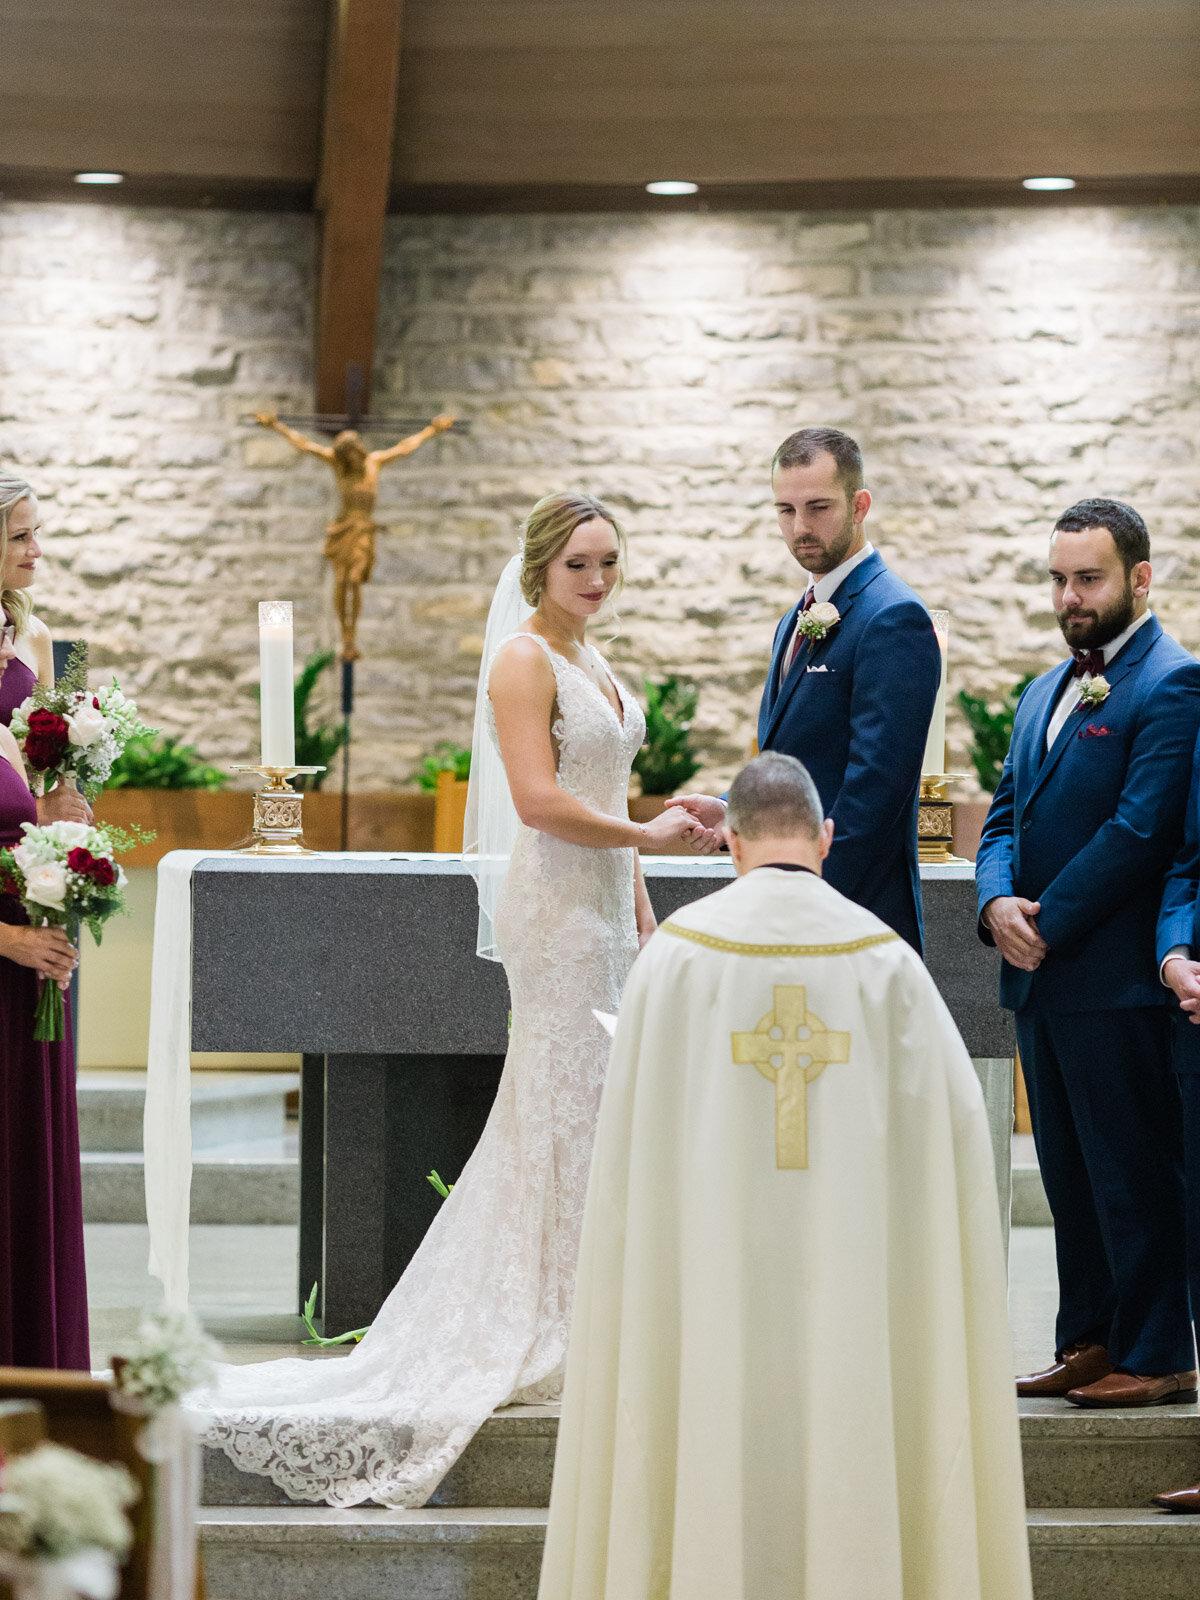 Elegant and Joyful Wedding at Crago Farms in Columbus, Ohio-24.jpg